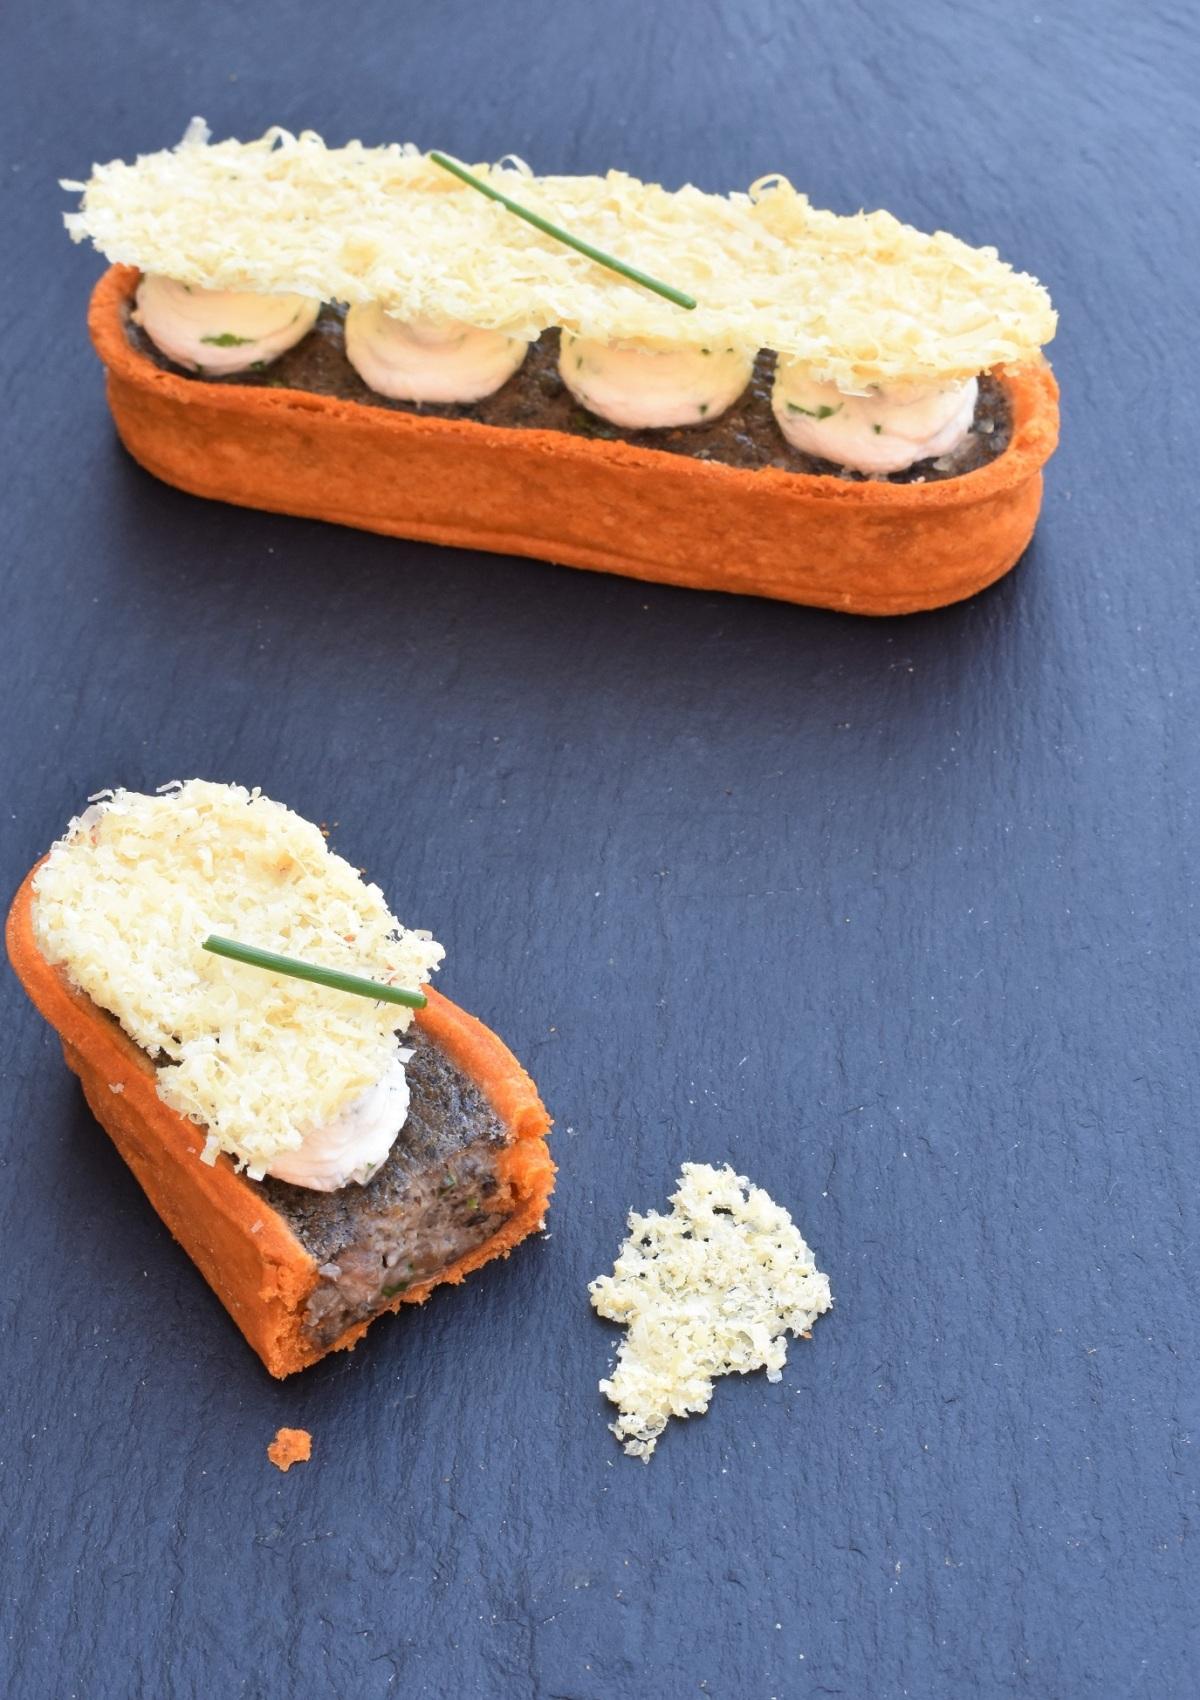 Mushroom and roasted garlictart